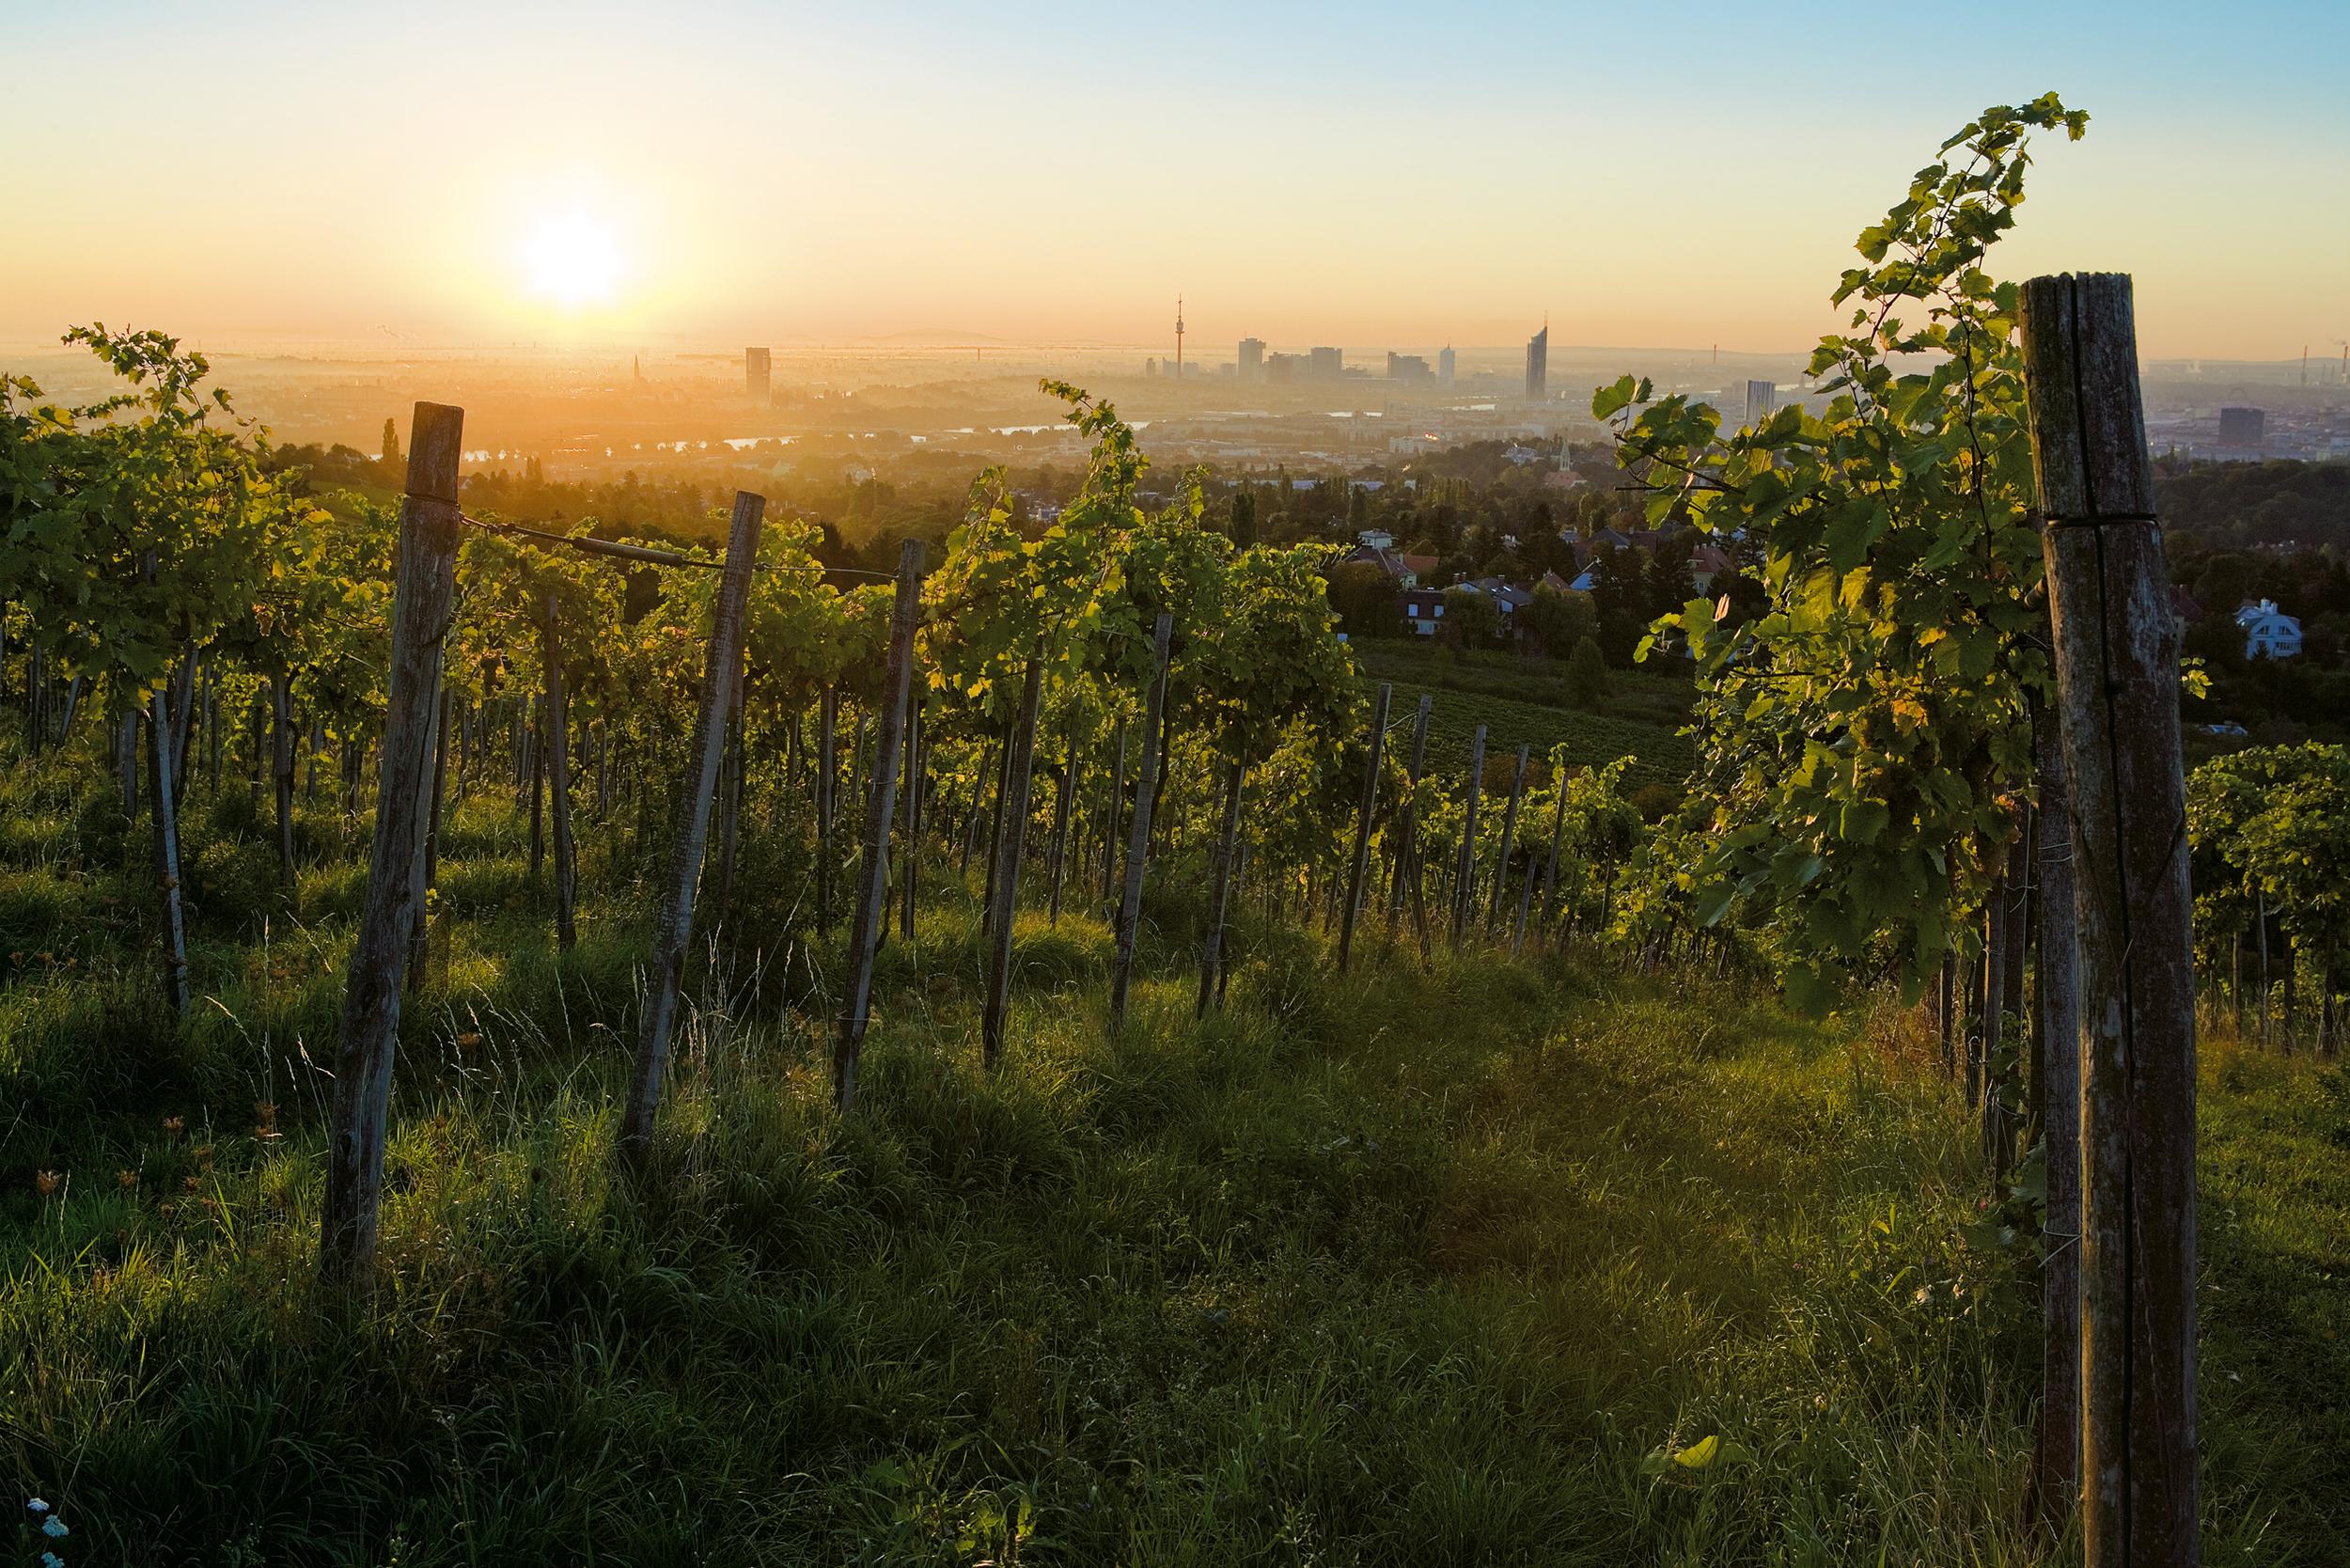 view of vineyard and city.jpg